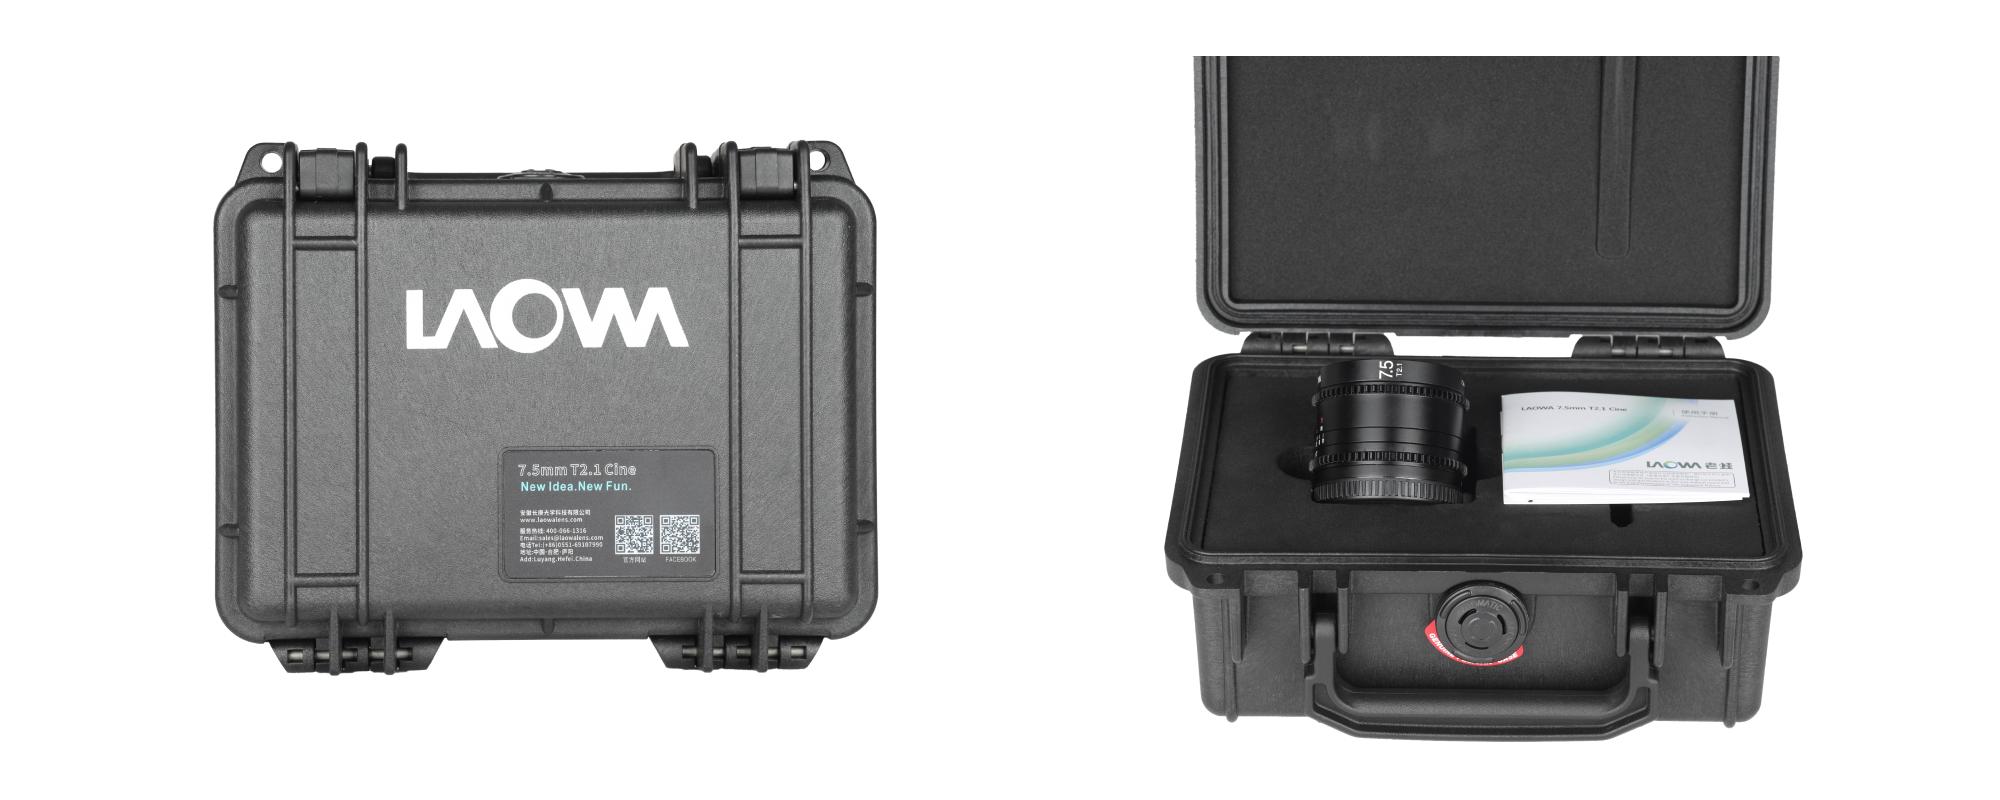 Venus Optics Laowa 7.5mm T2.1 lens for Micro 4/3 Cine on white background